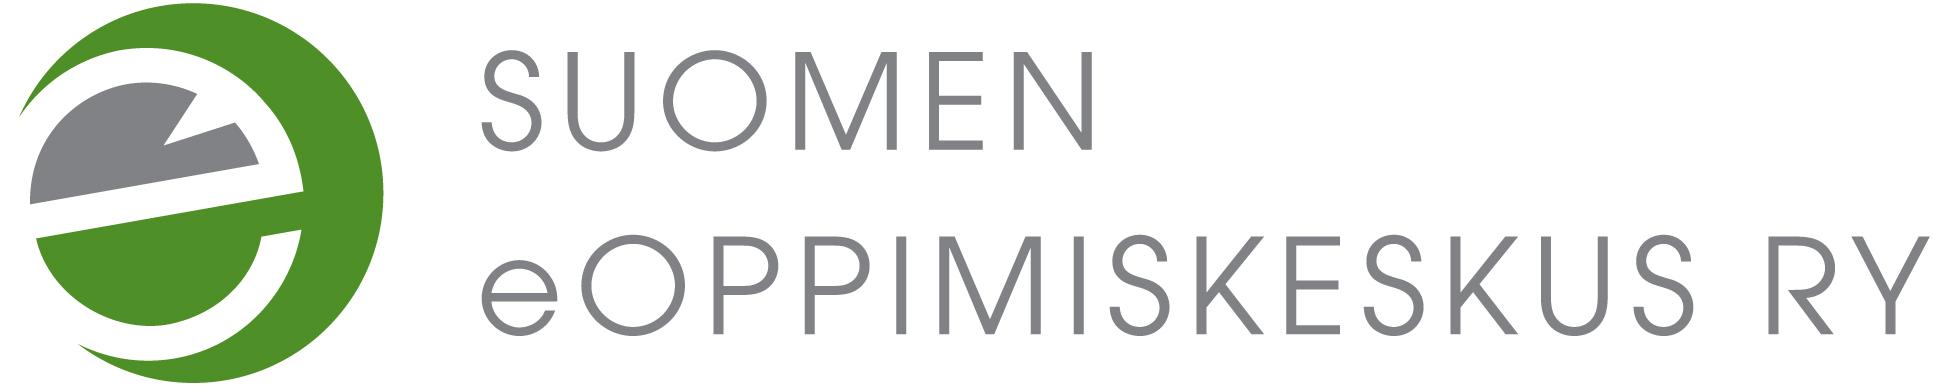 Suomen eOppimiskeskus ry:n logo